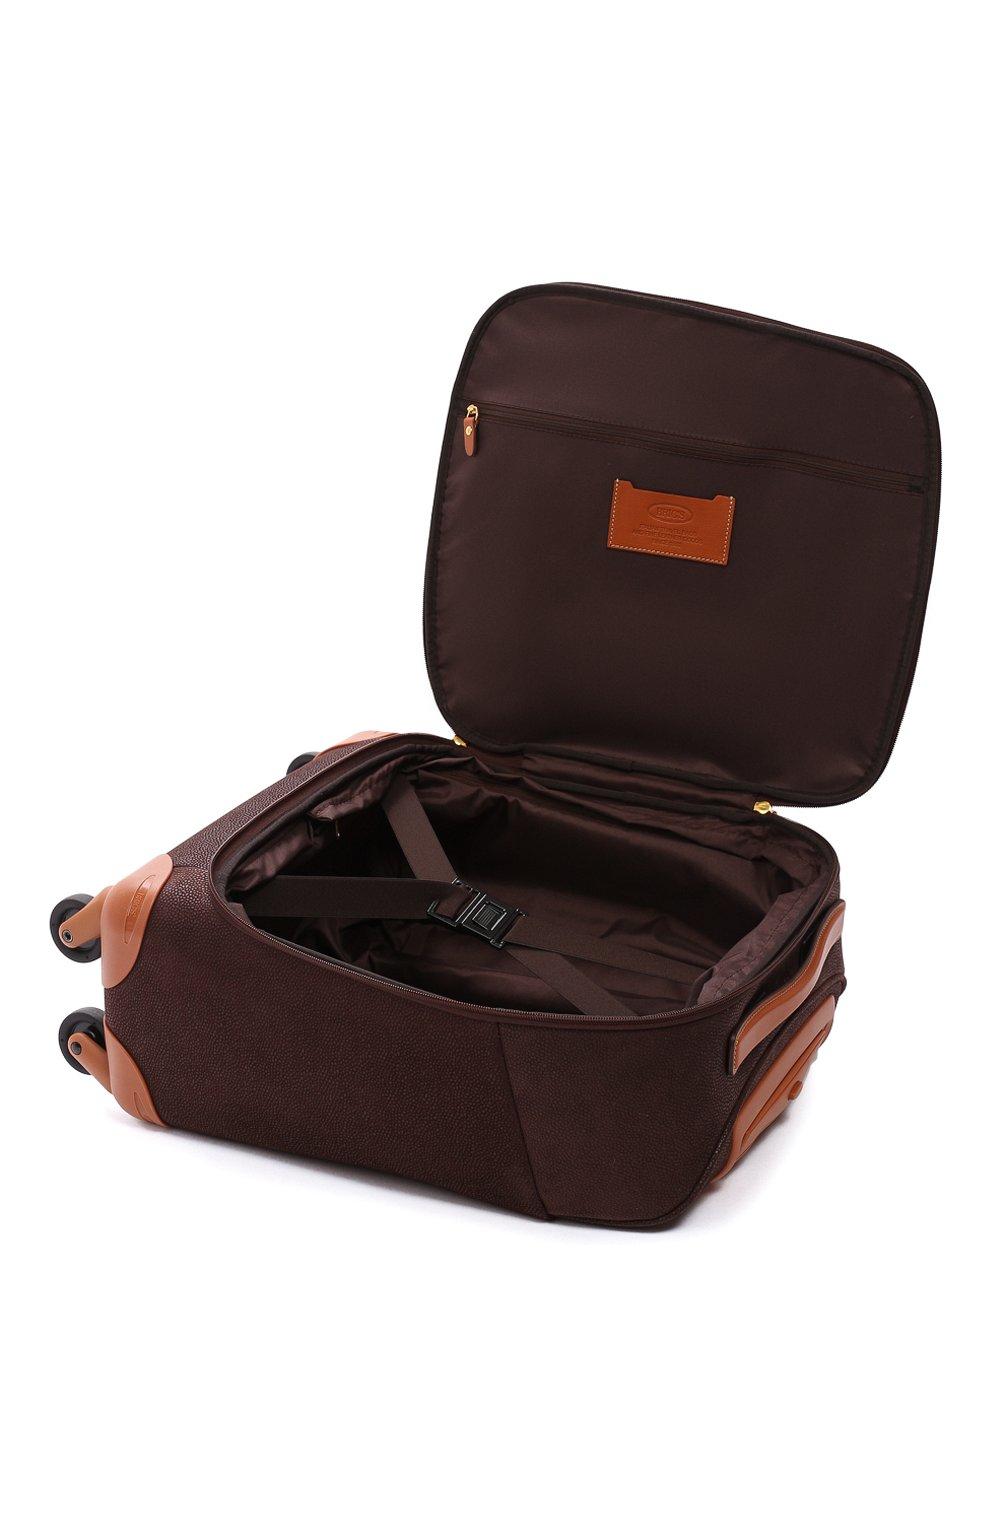 Дорожный чемодан Life extra small | Фото №3